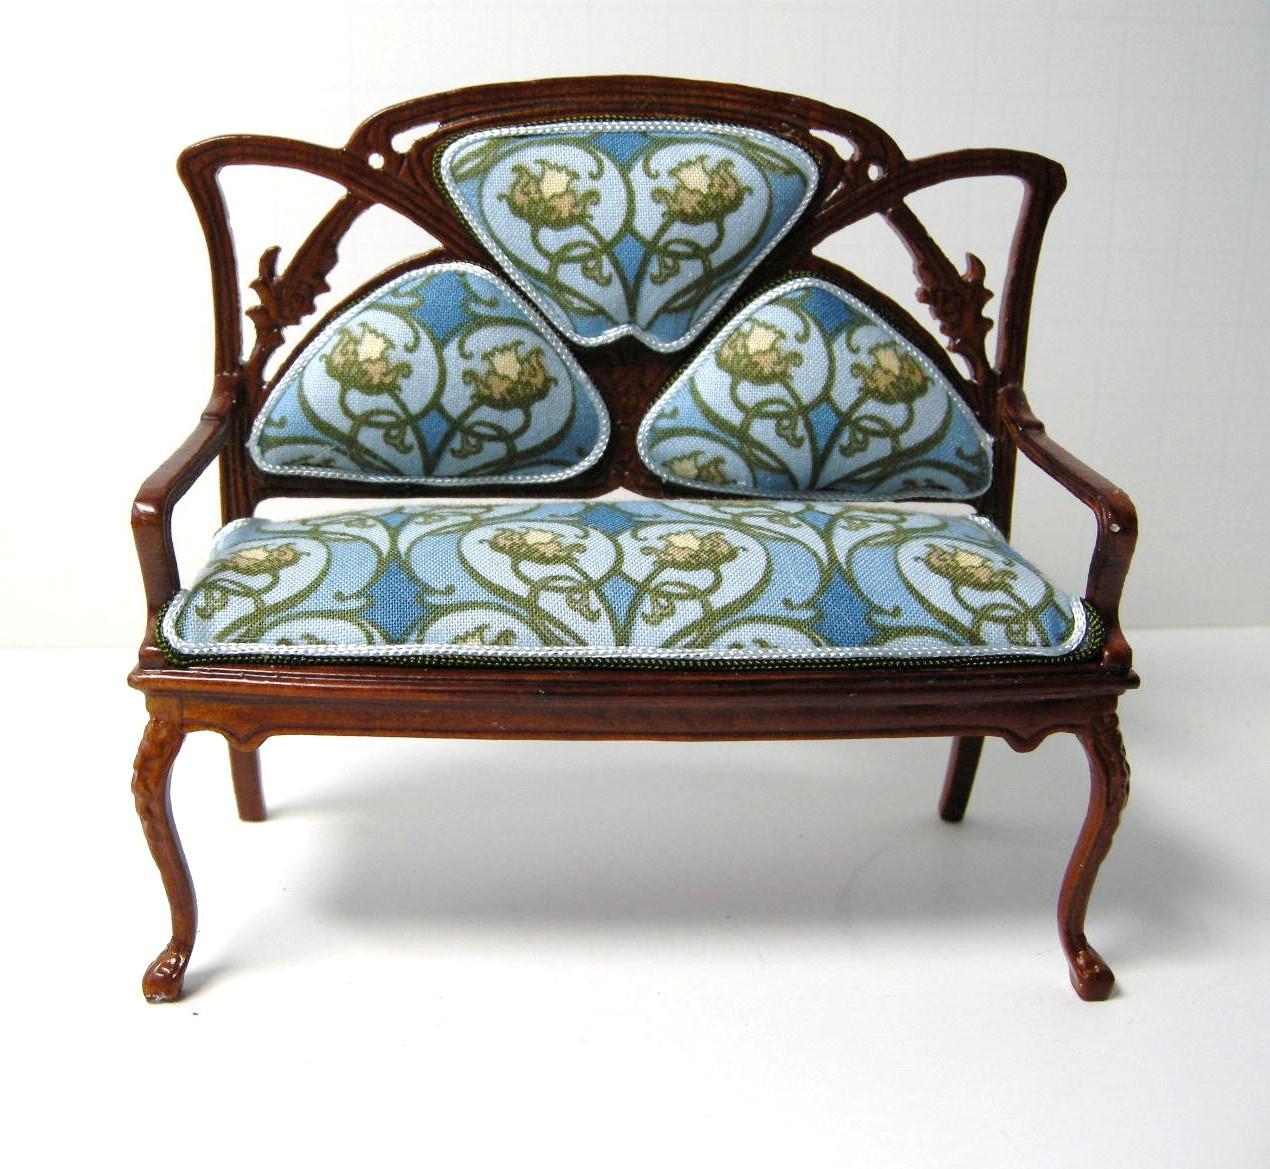 Art Nouveau Furniture Furniture Art Nouveau